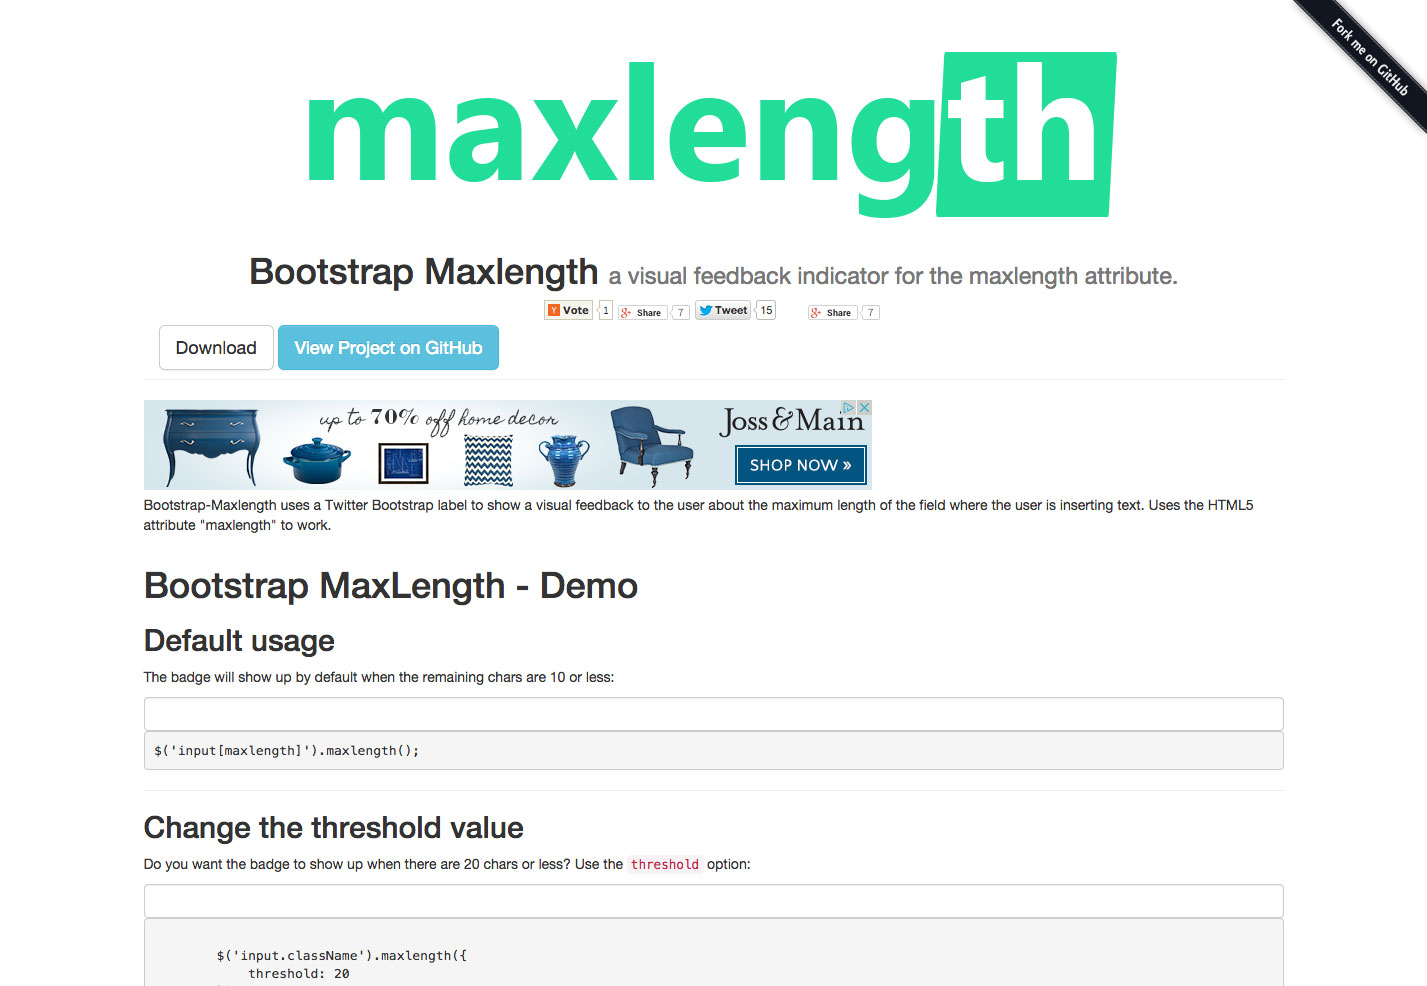 boostrap maxlength